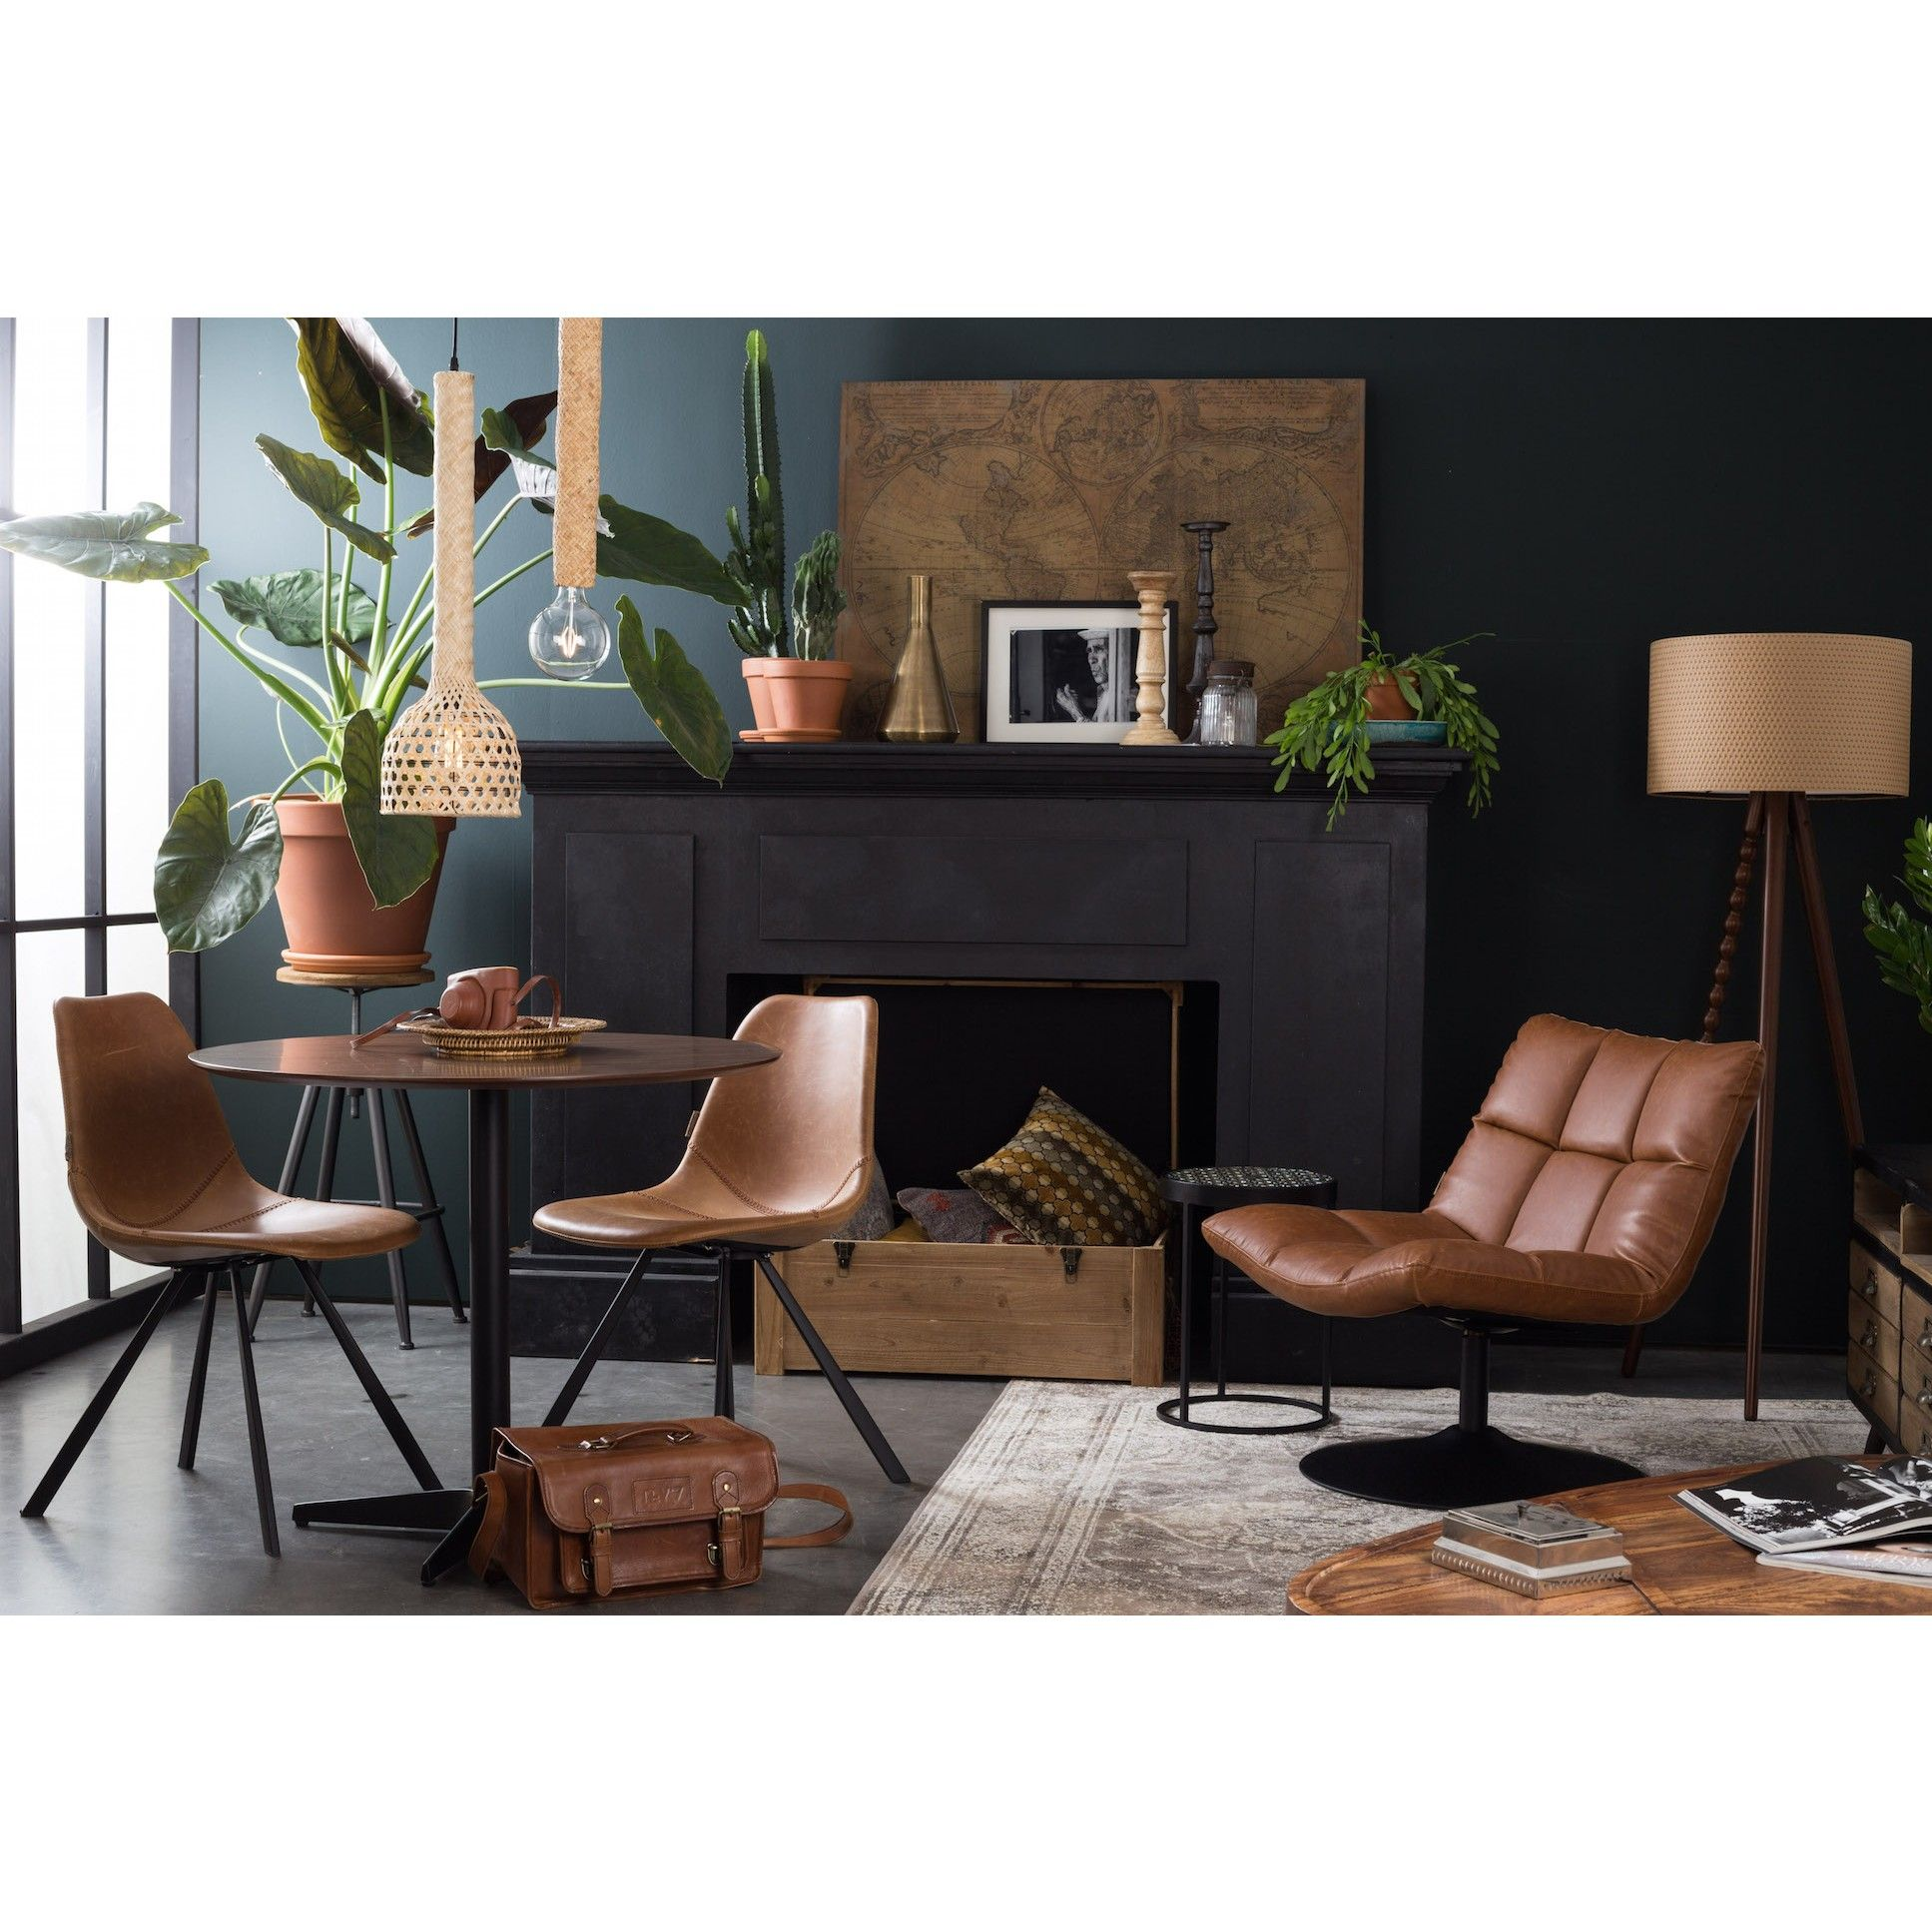 Dutchbone Bar Lounge stoel - Fauteuils - Stoelen - Woonkamer ...